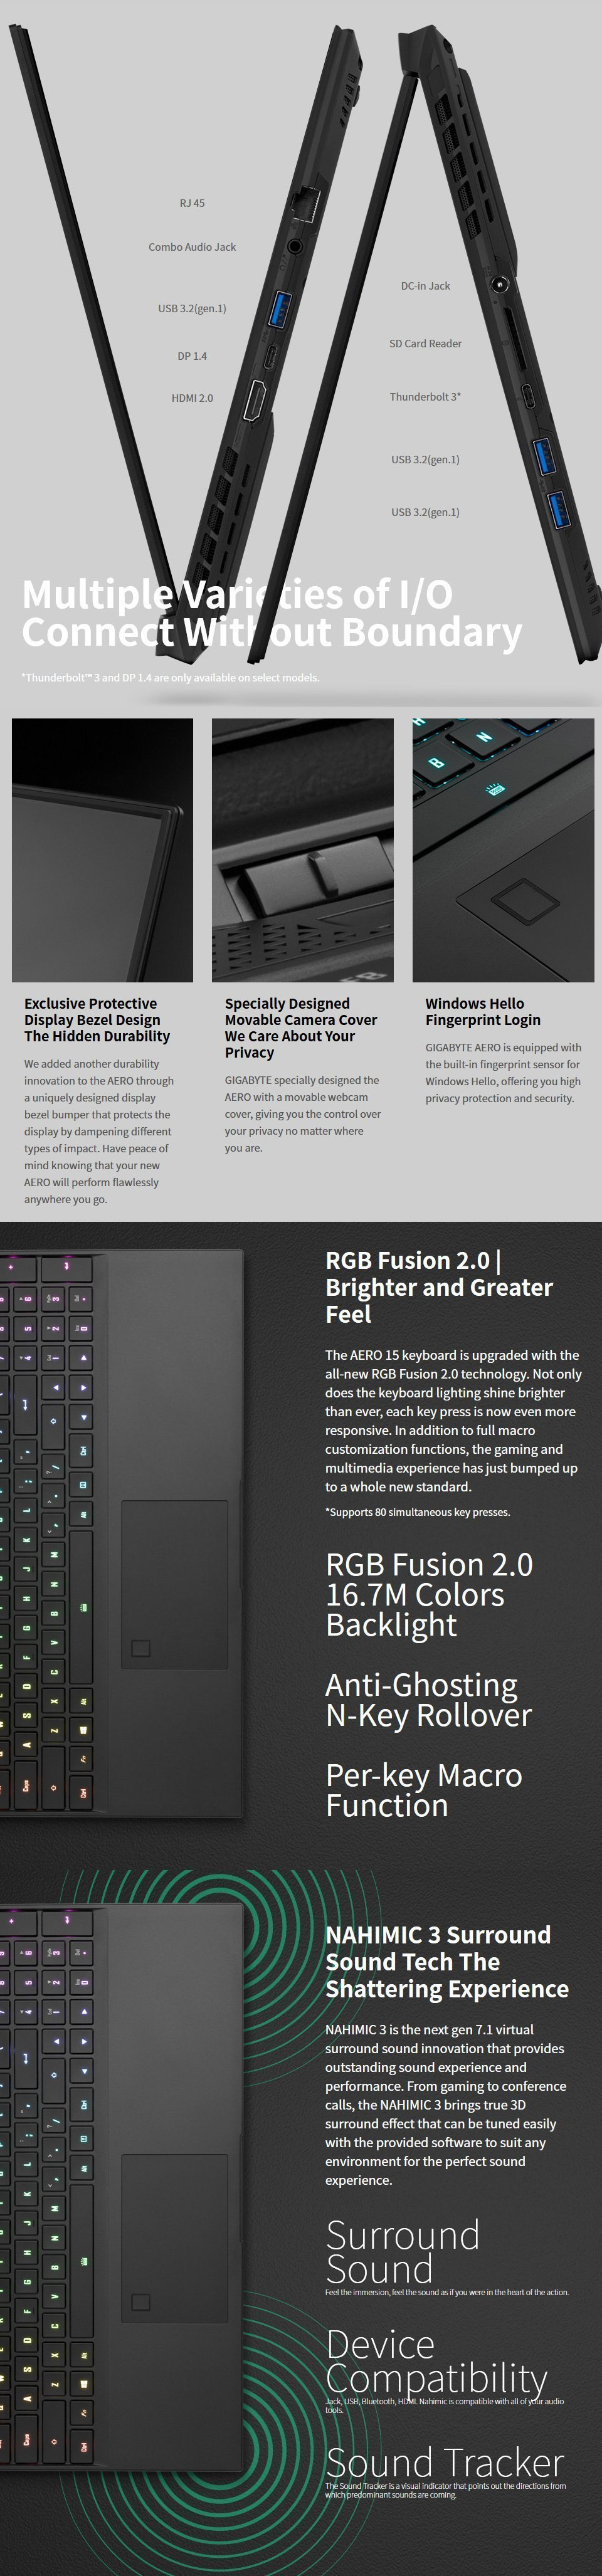 Gigabyte AERO 15 Core i7 RTX 2060 15.6in OLED UHD Laptop features 5